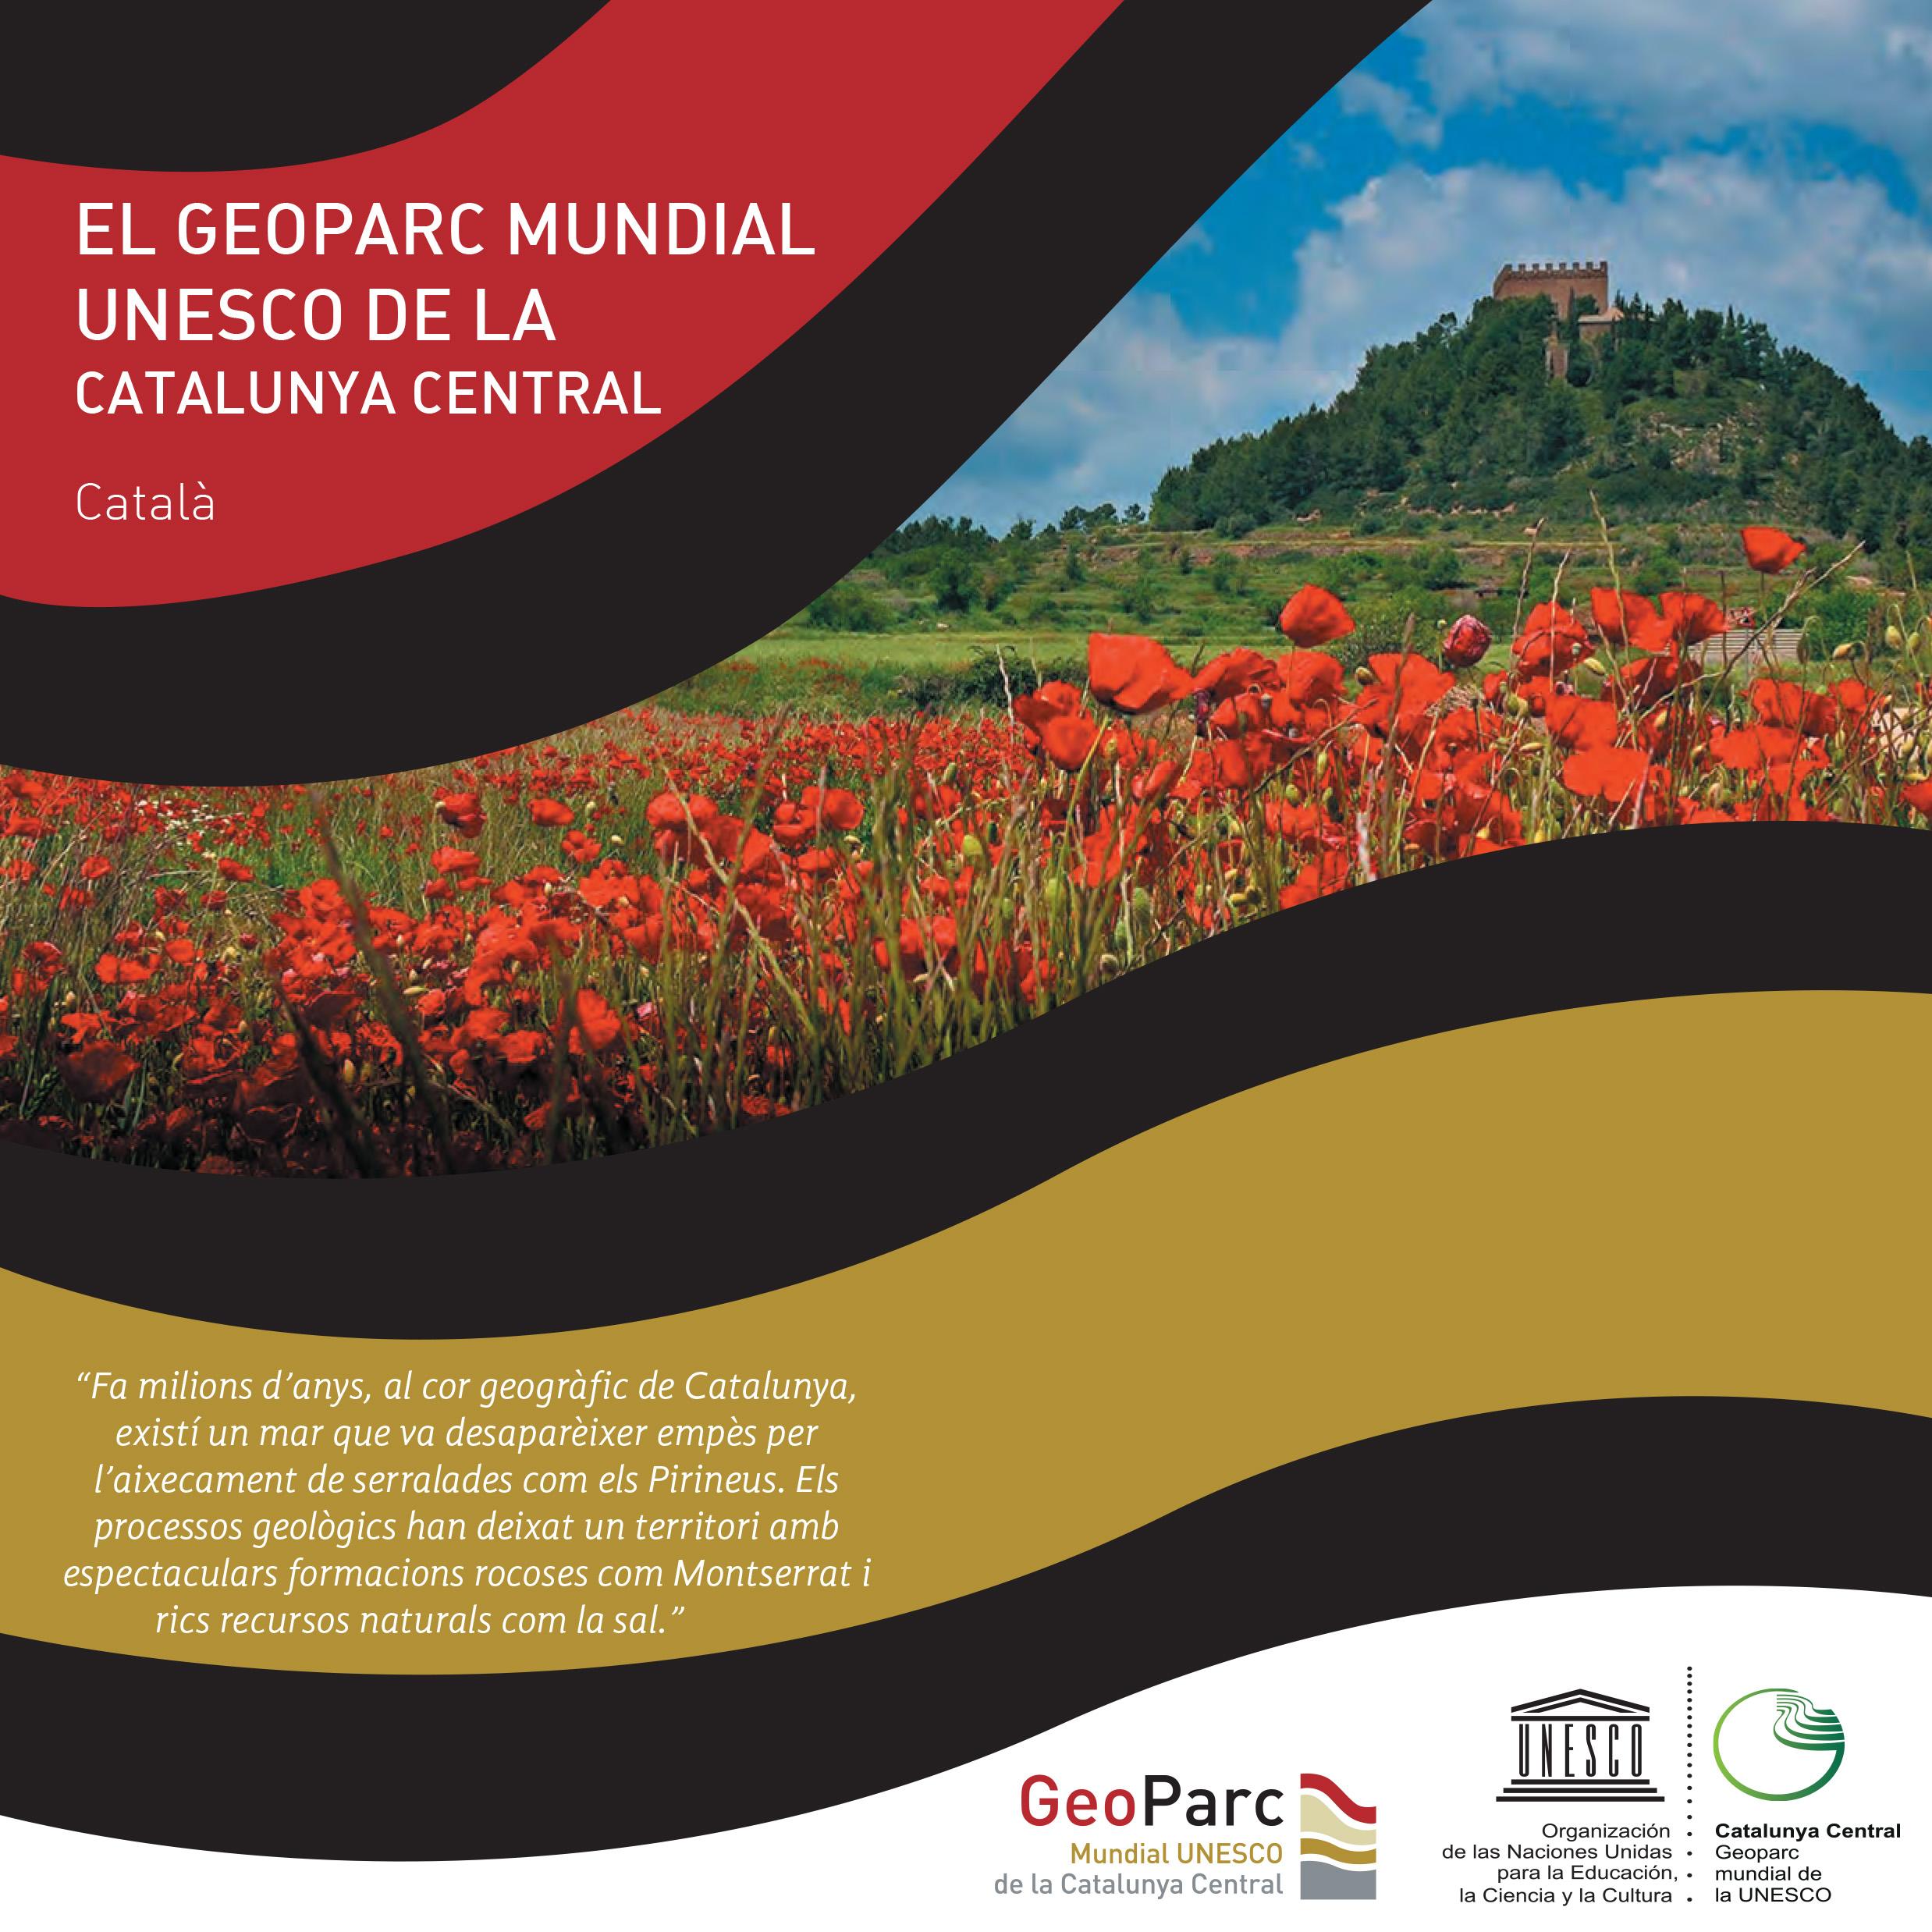 Geoparc Maundial UNESCO de la Catalunya Central